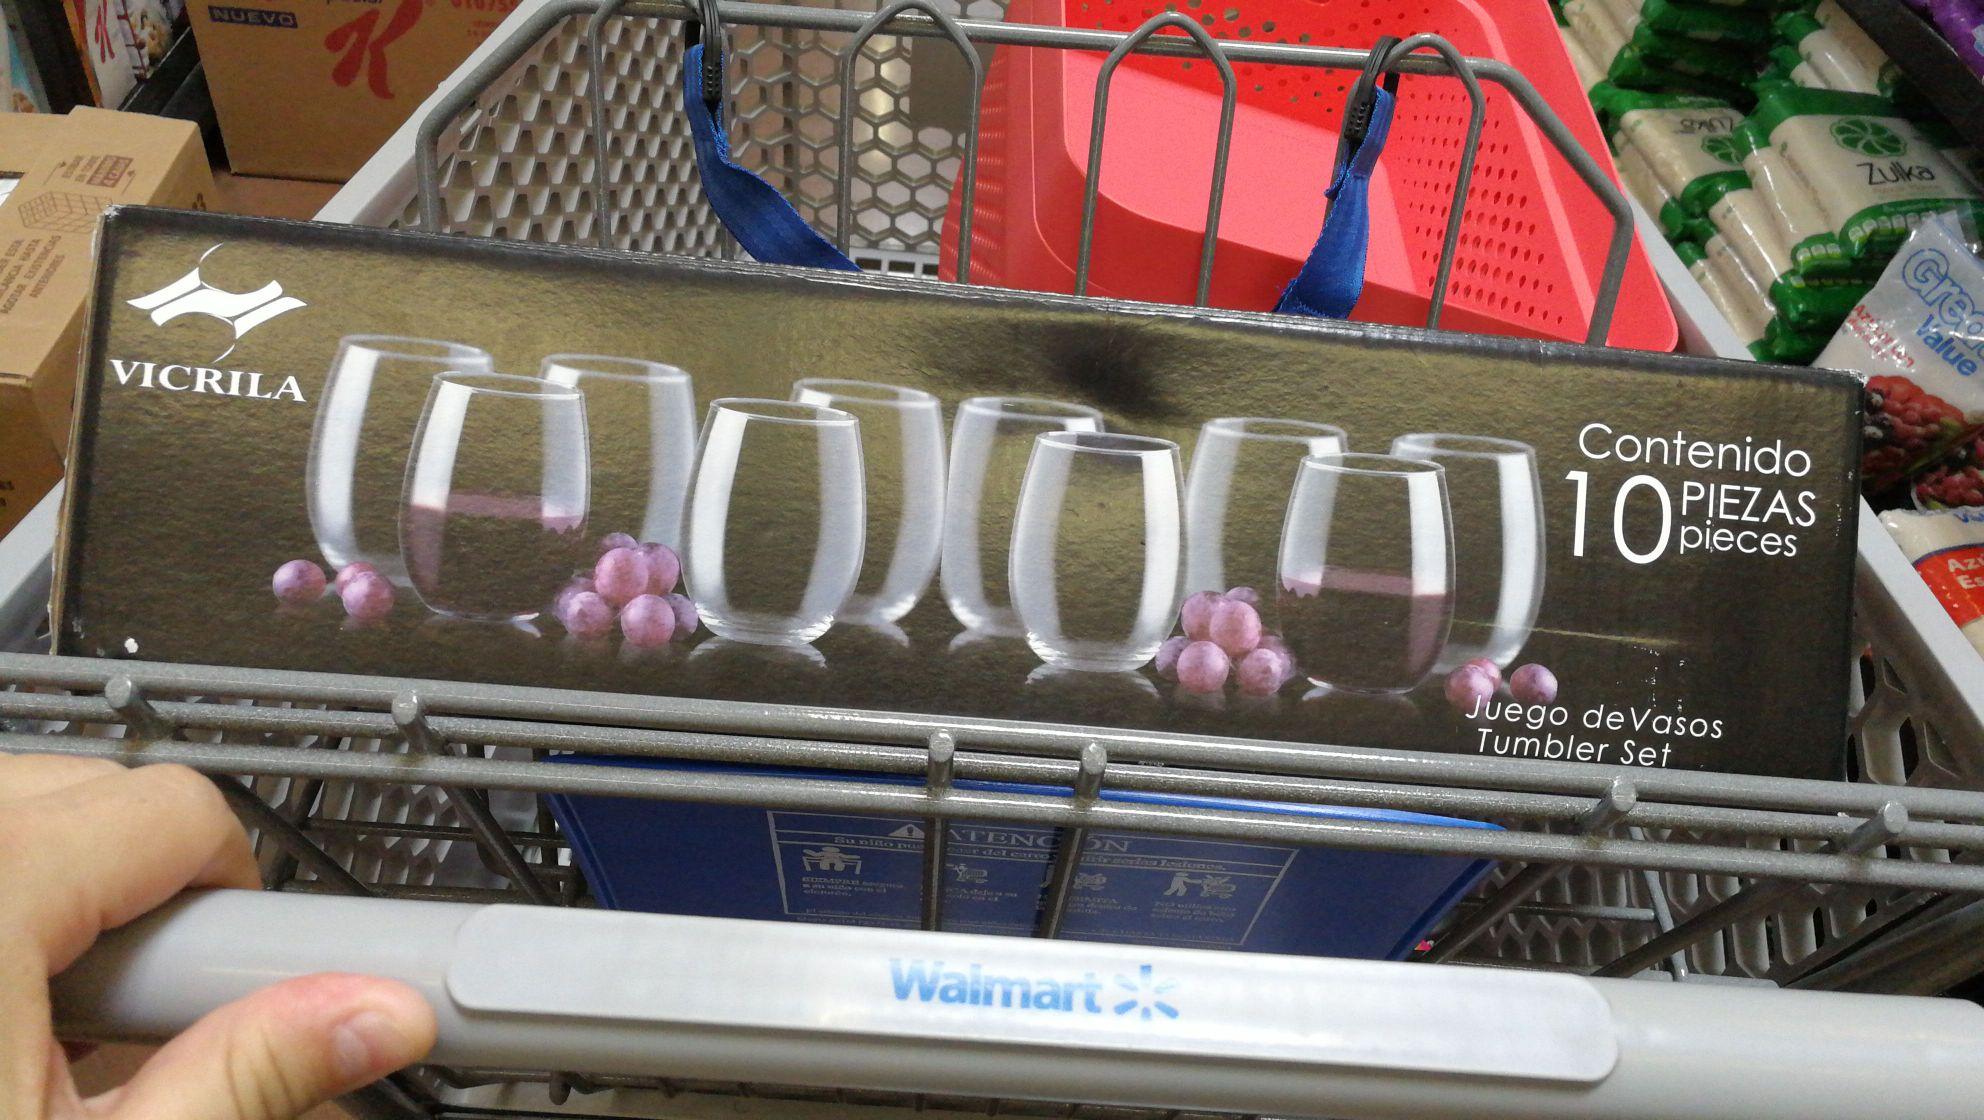 Walmart Cd Carmen: Set de 10 vasos a solo 45 pesitos